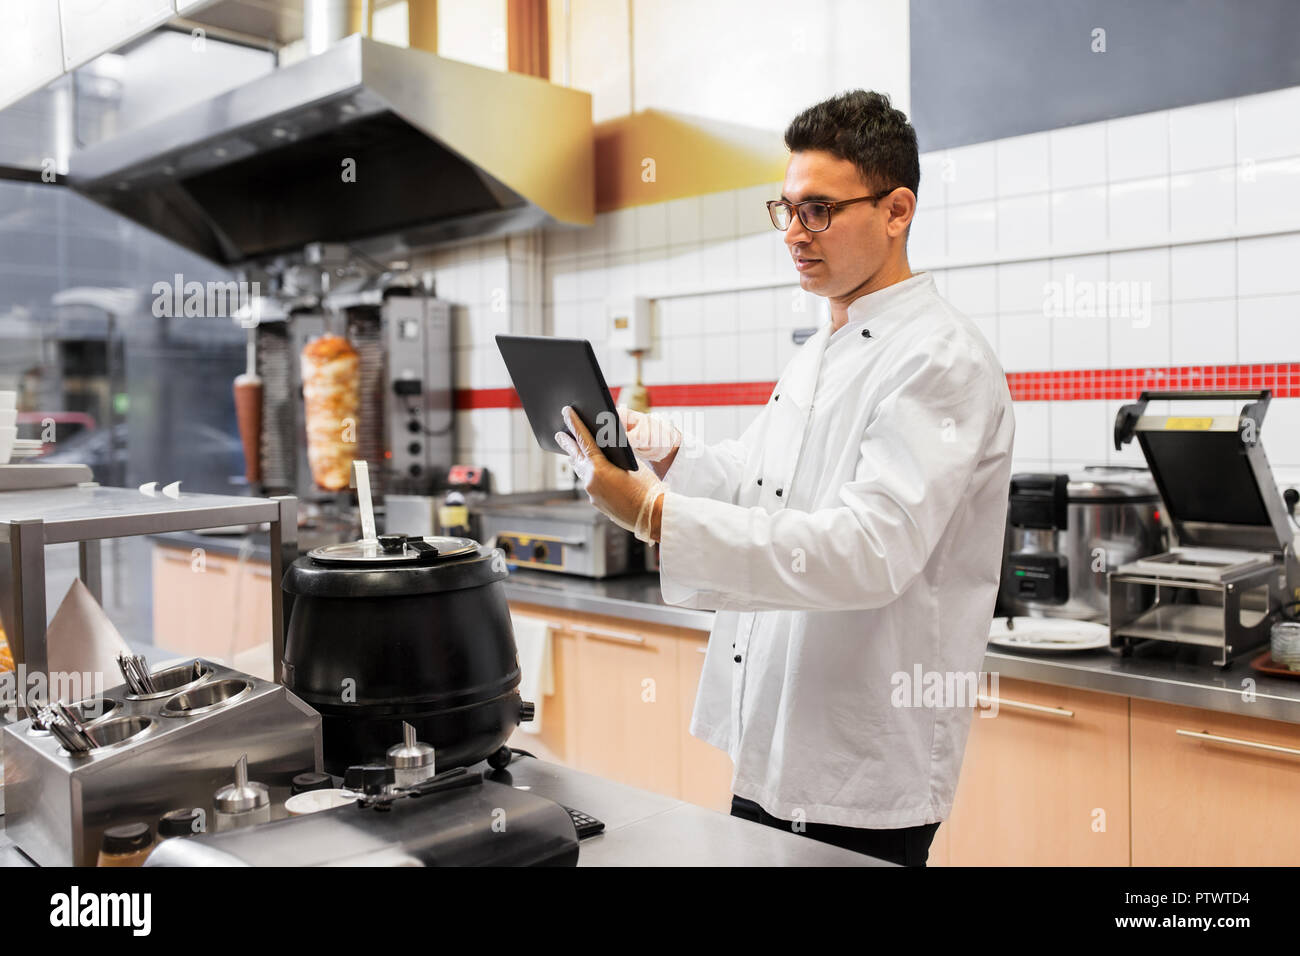 Koch Kochen mit Tablet-pc im Restaurantküche Stockbild